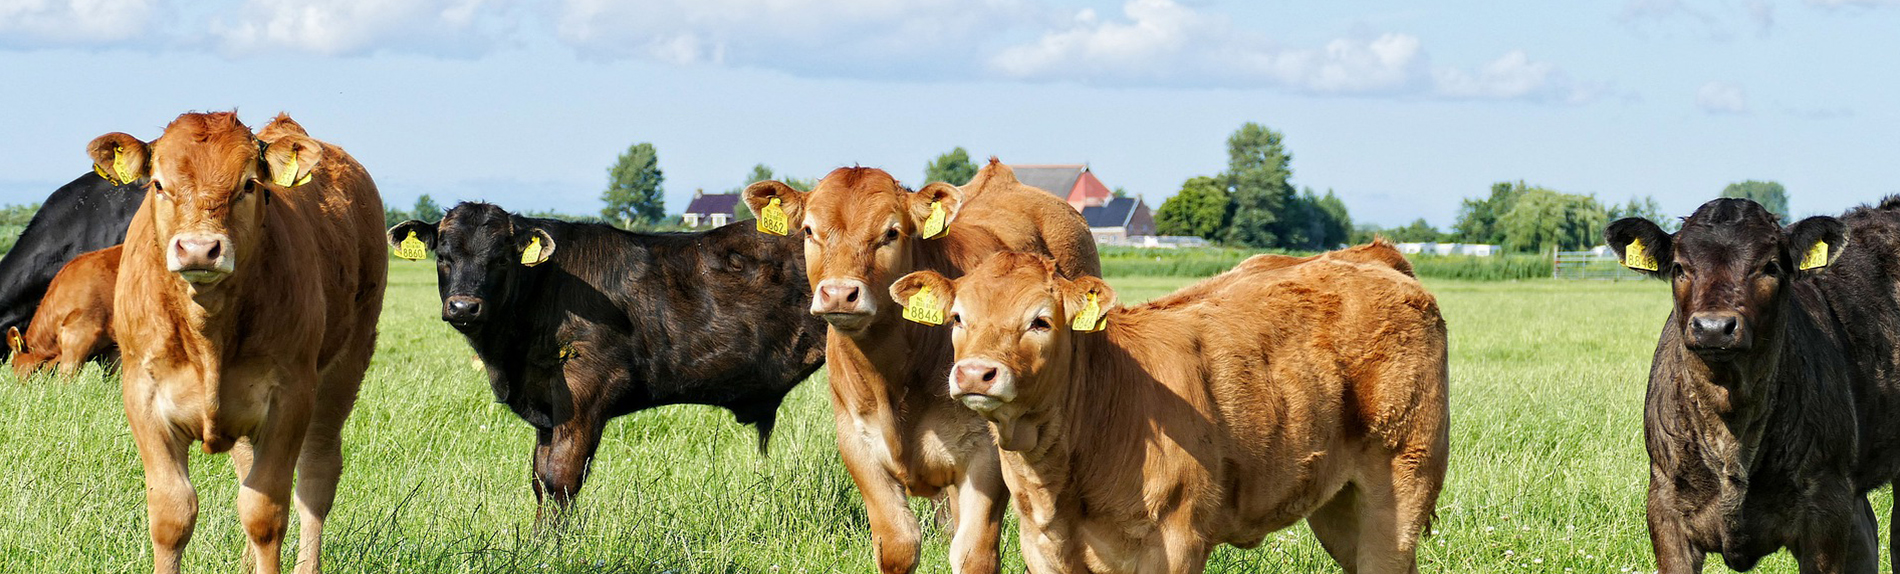 livestock tax deferral